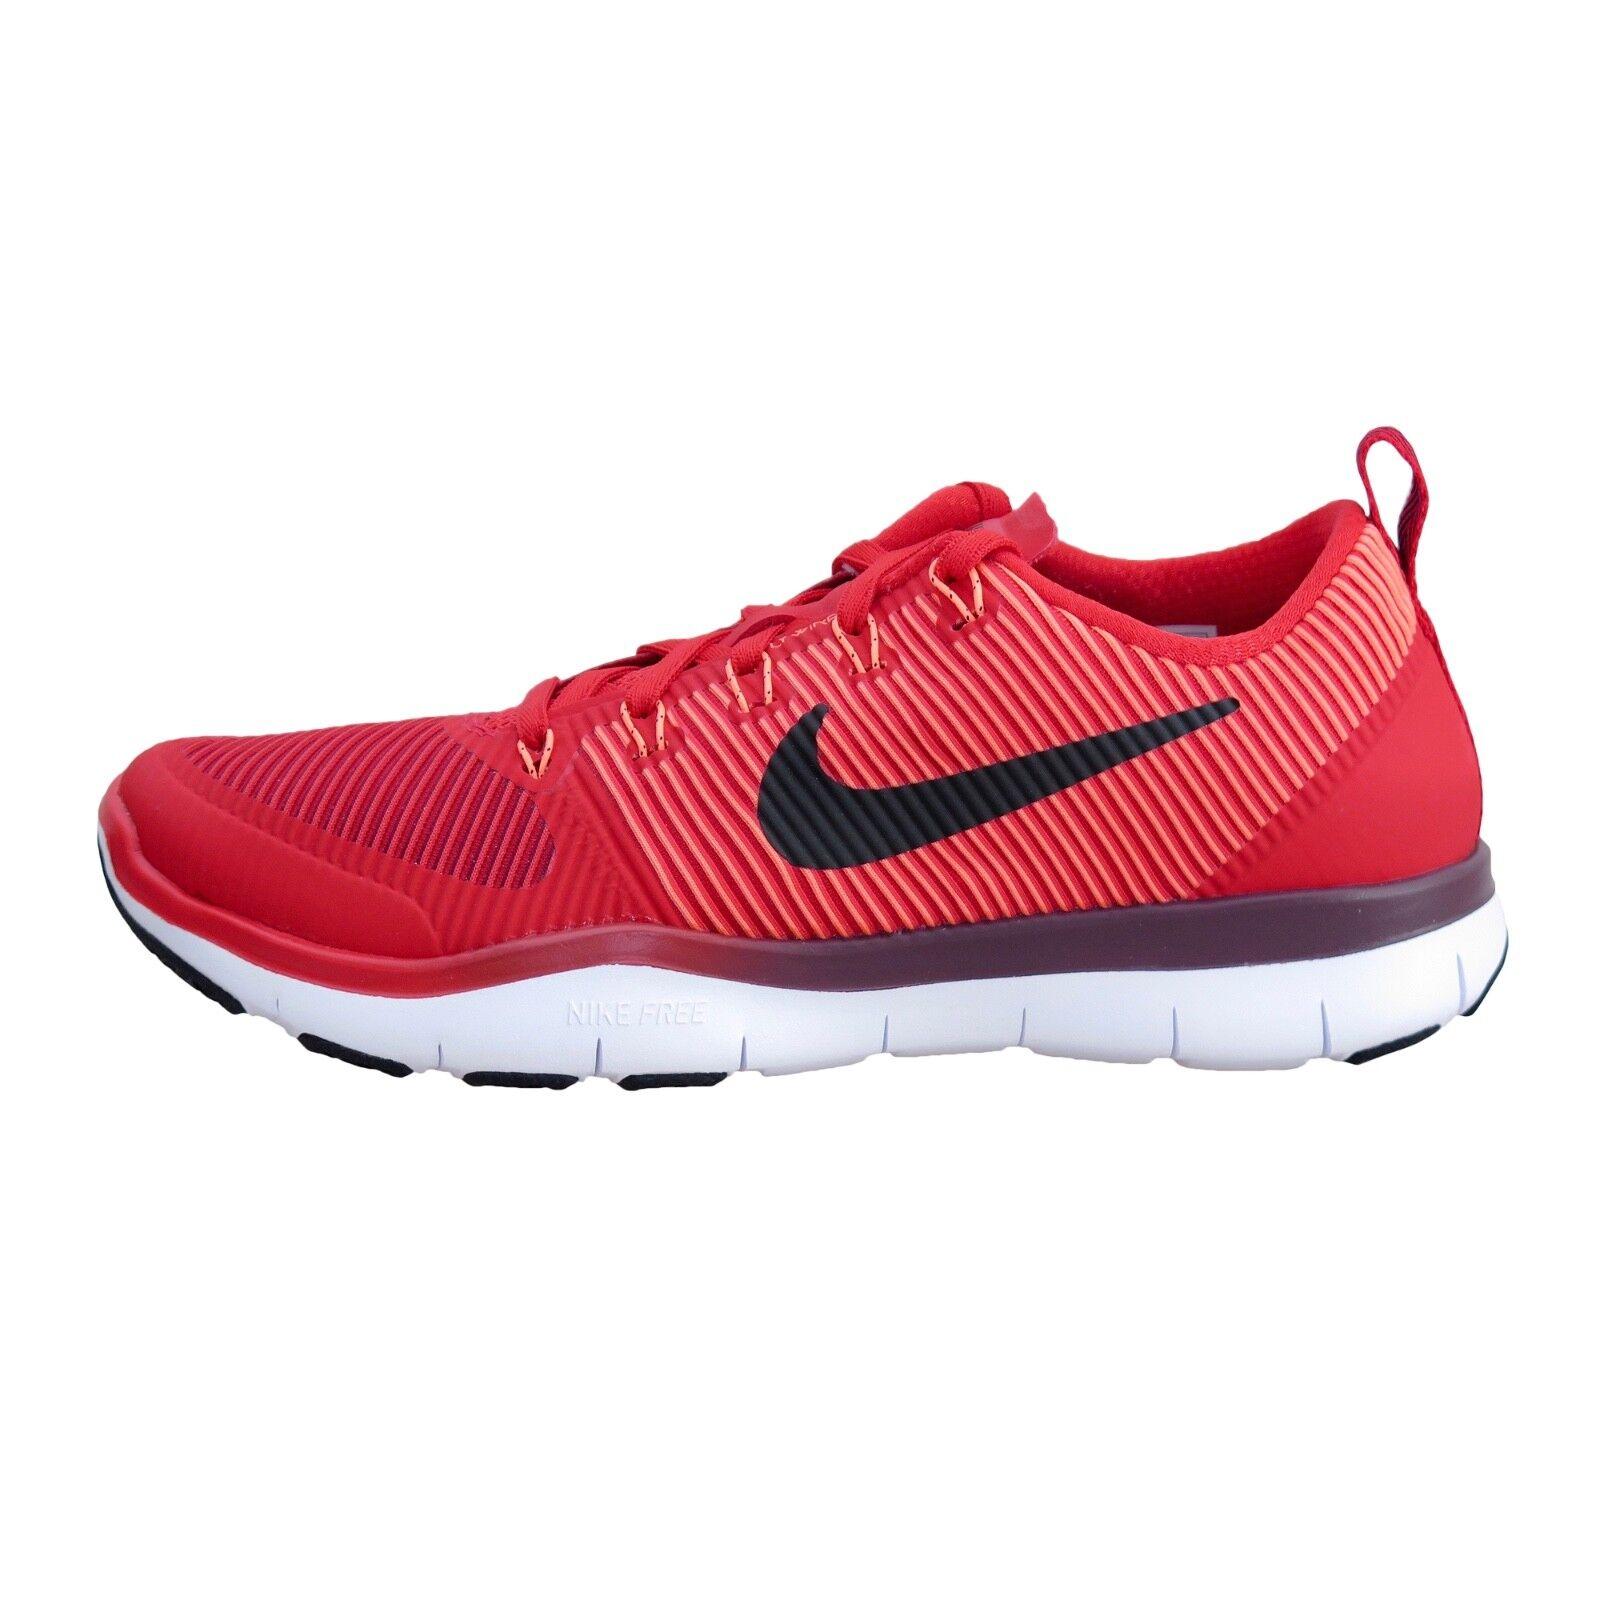 Nike Free Train Versatility rot - Größen 40, 41, 47 - 833258-606